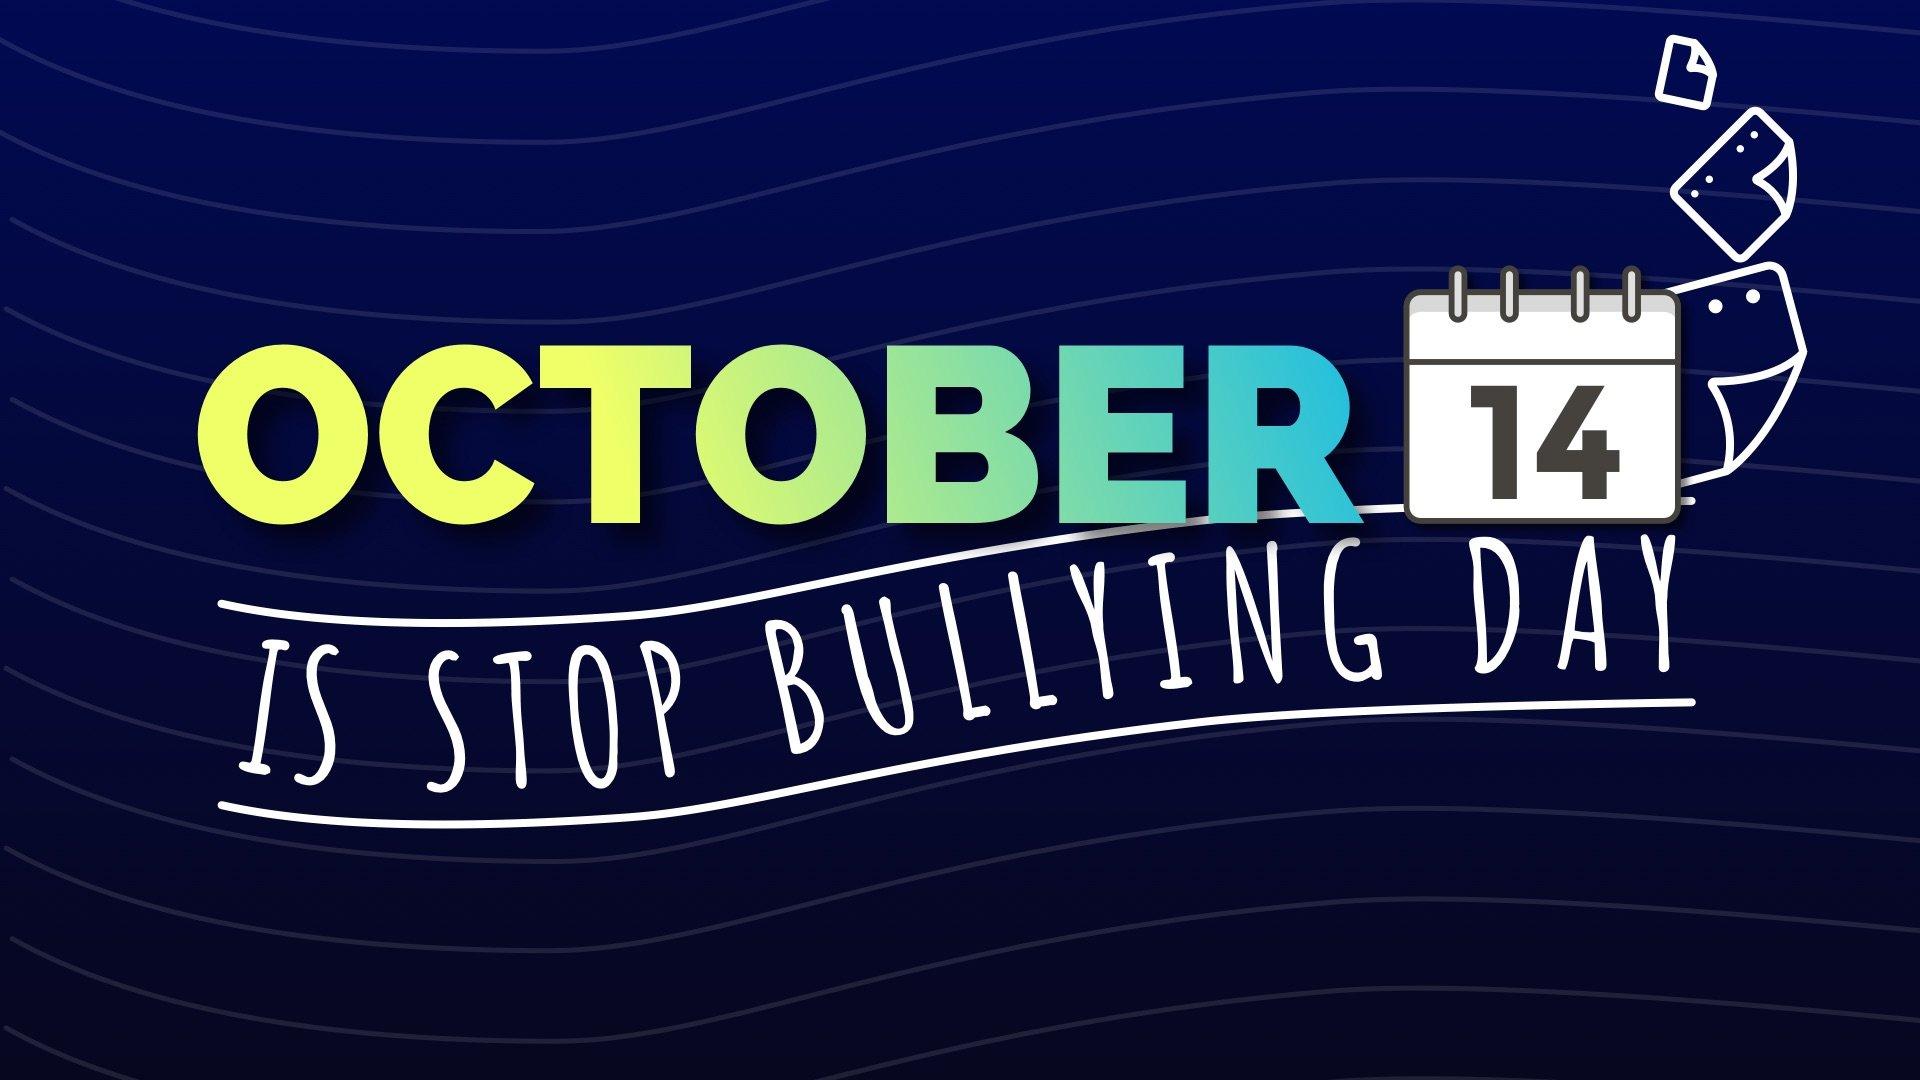 anti-bullying-poster-stop-bullying-day-october